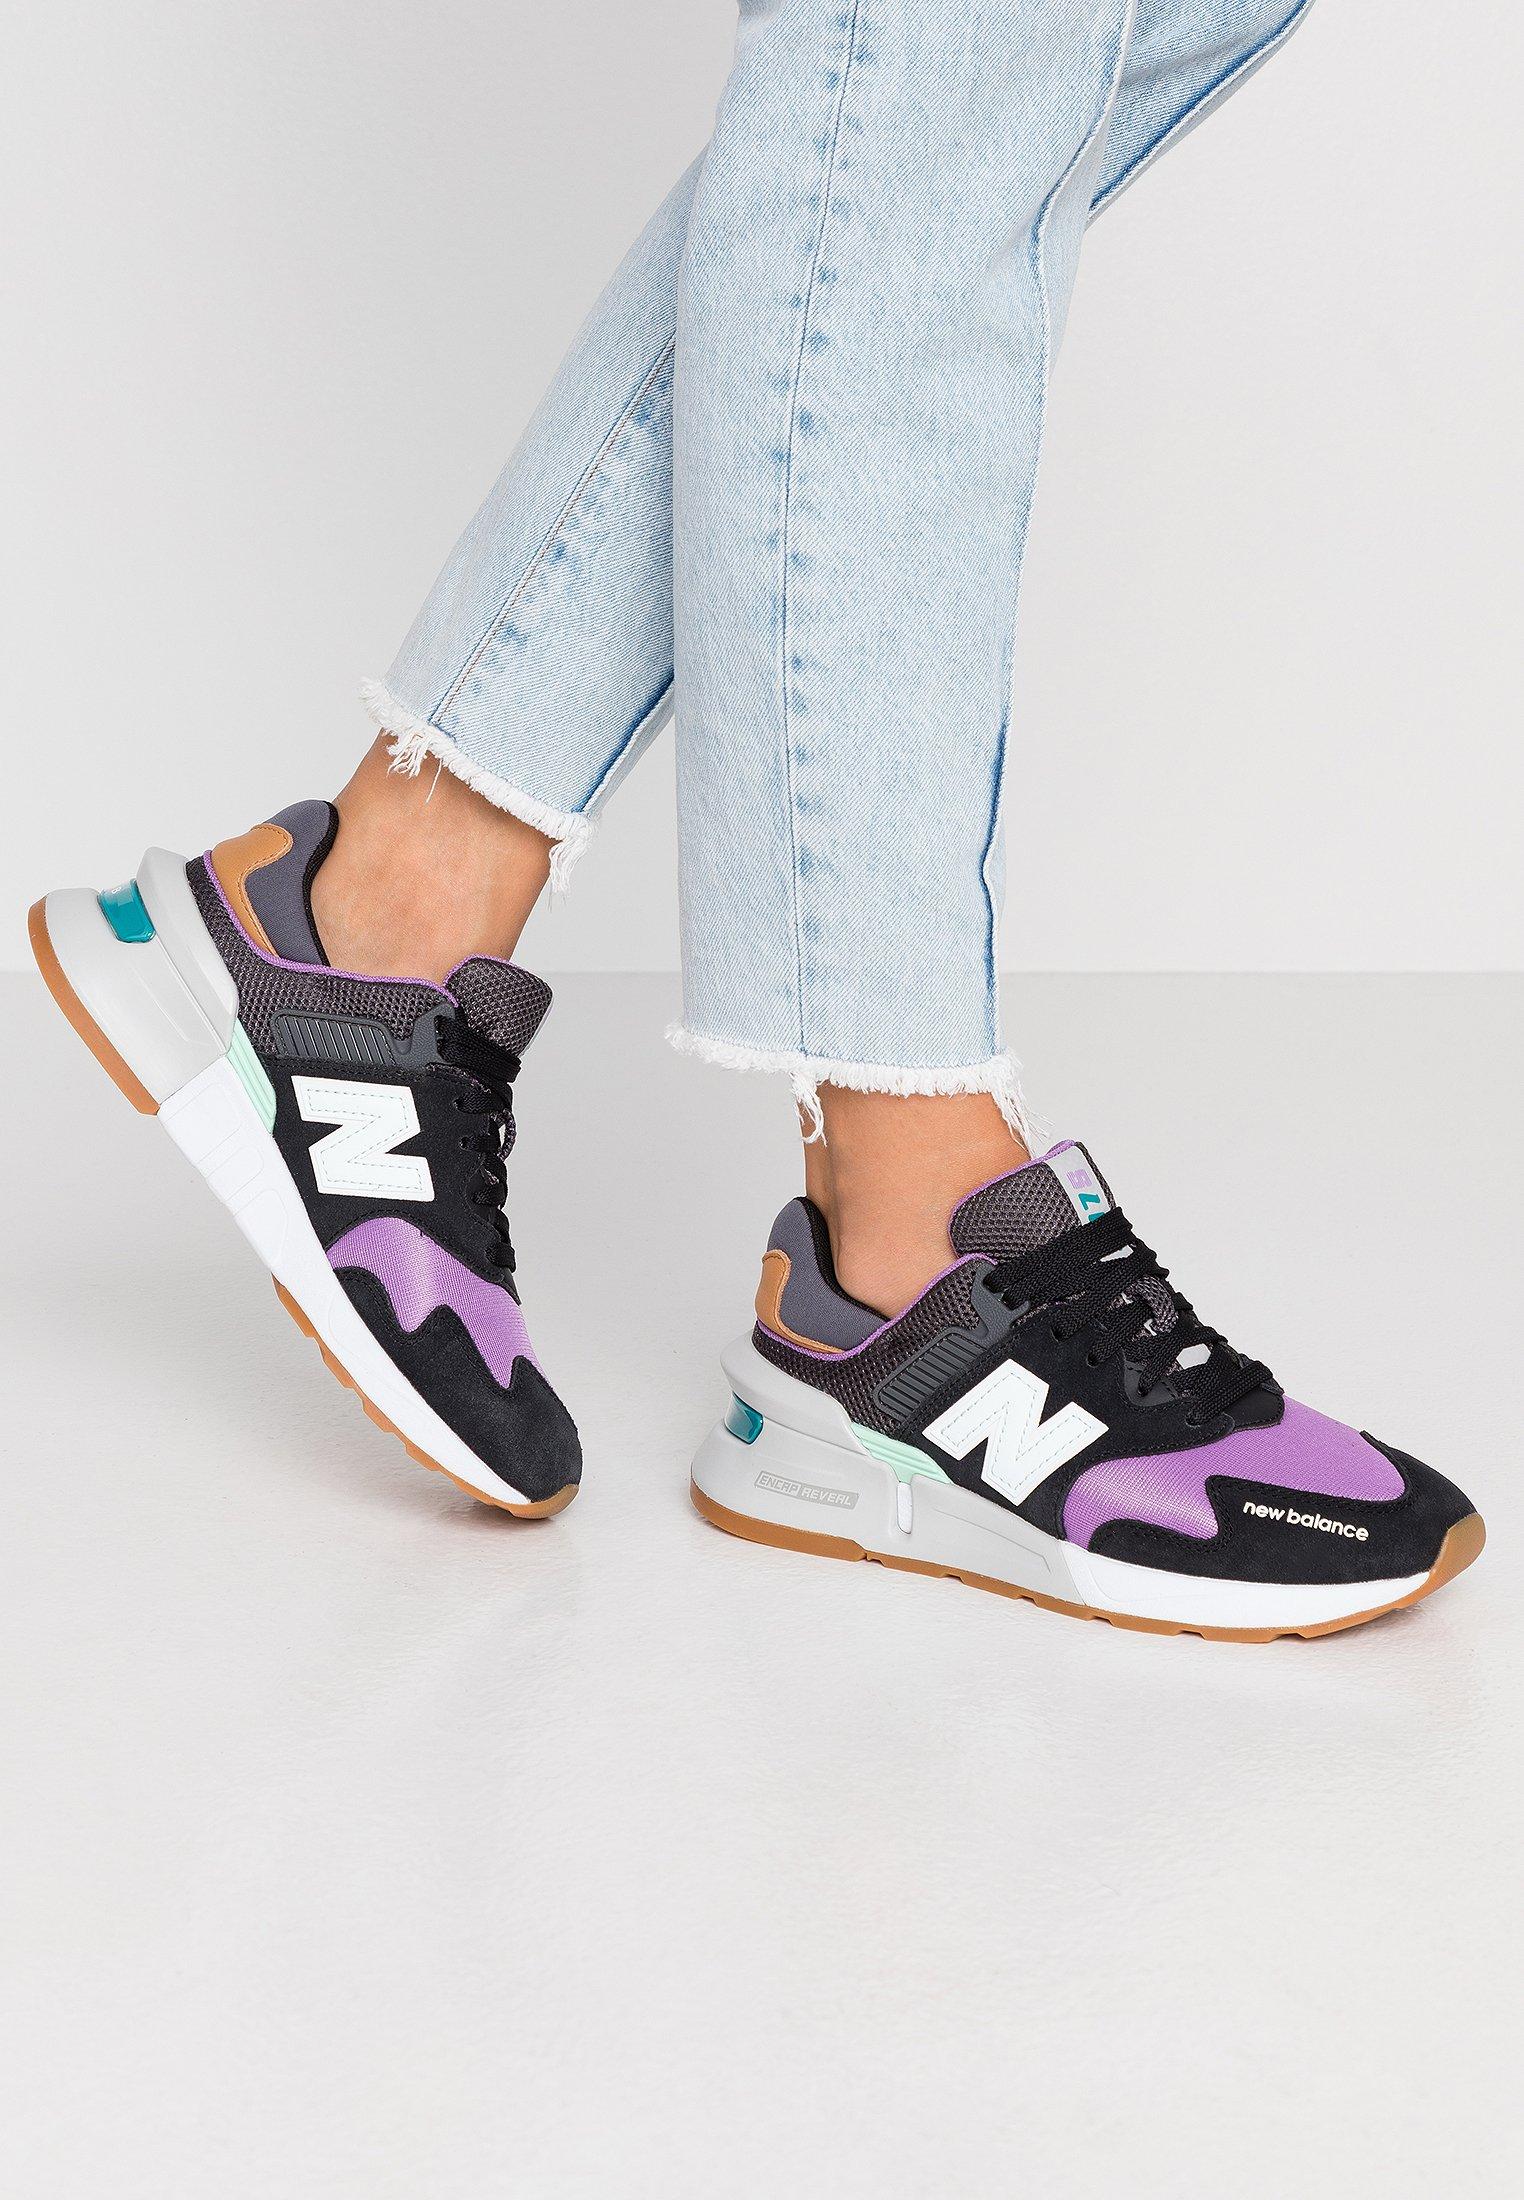 new balance ws997